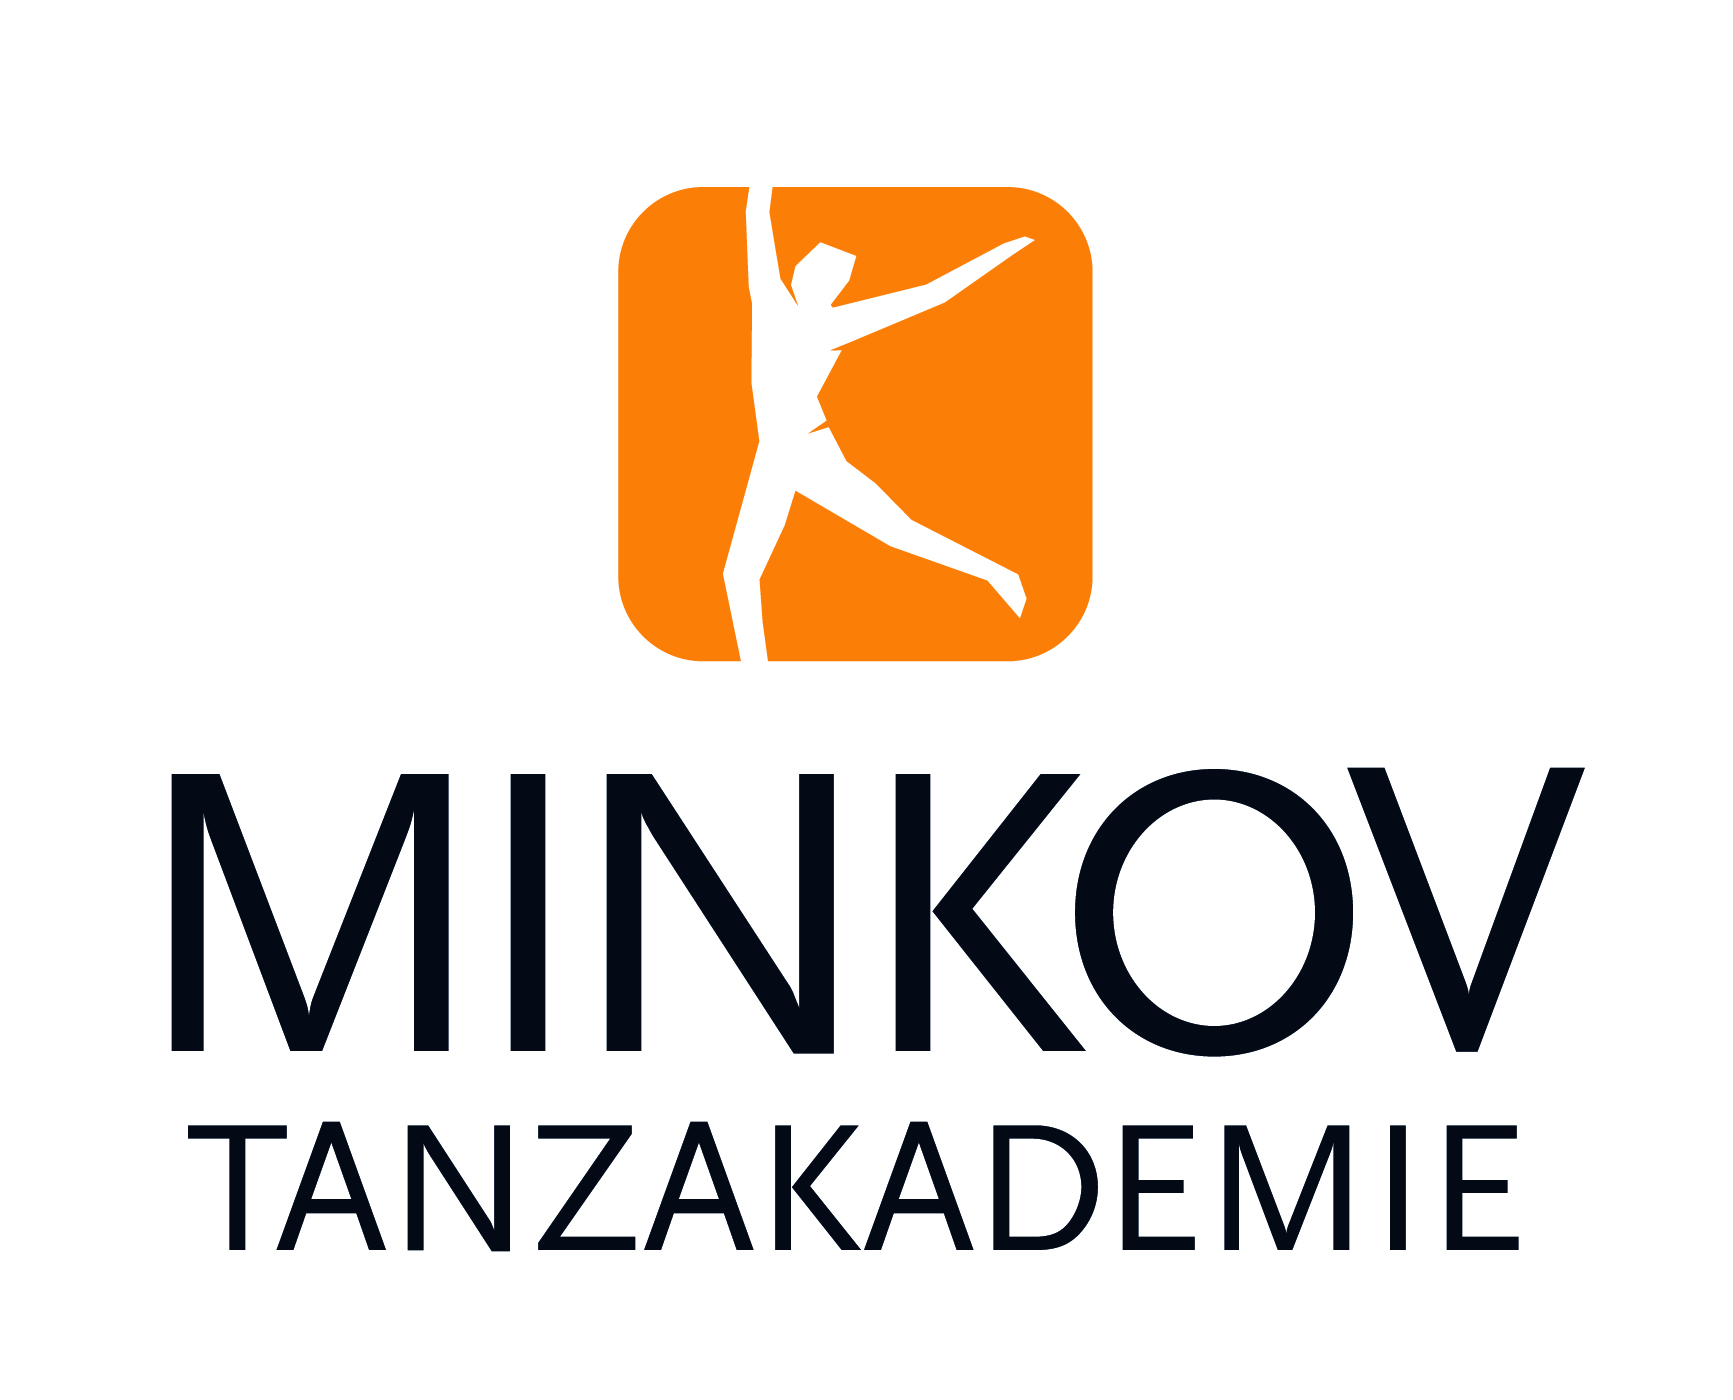 Tanzakademie Minkov